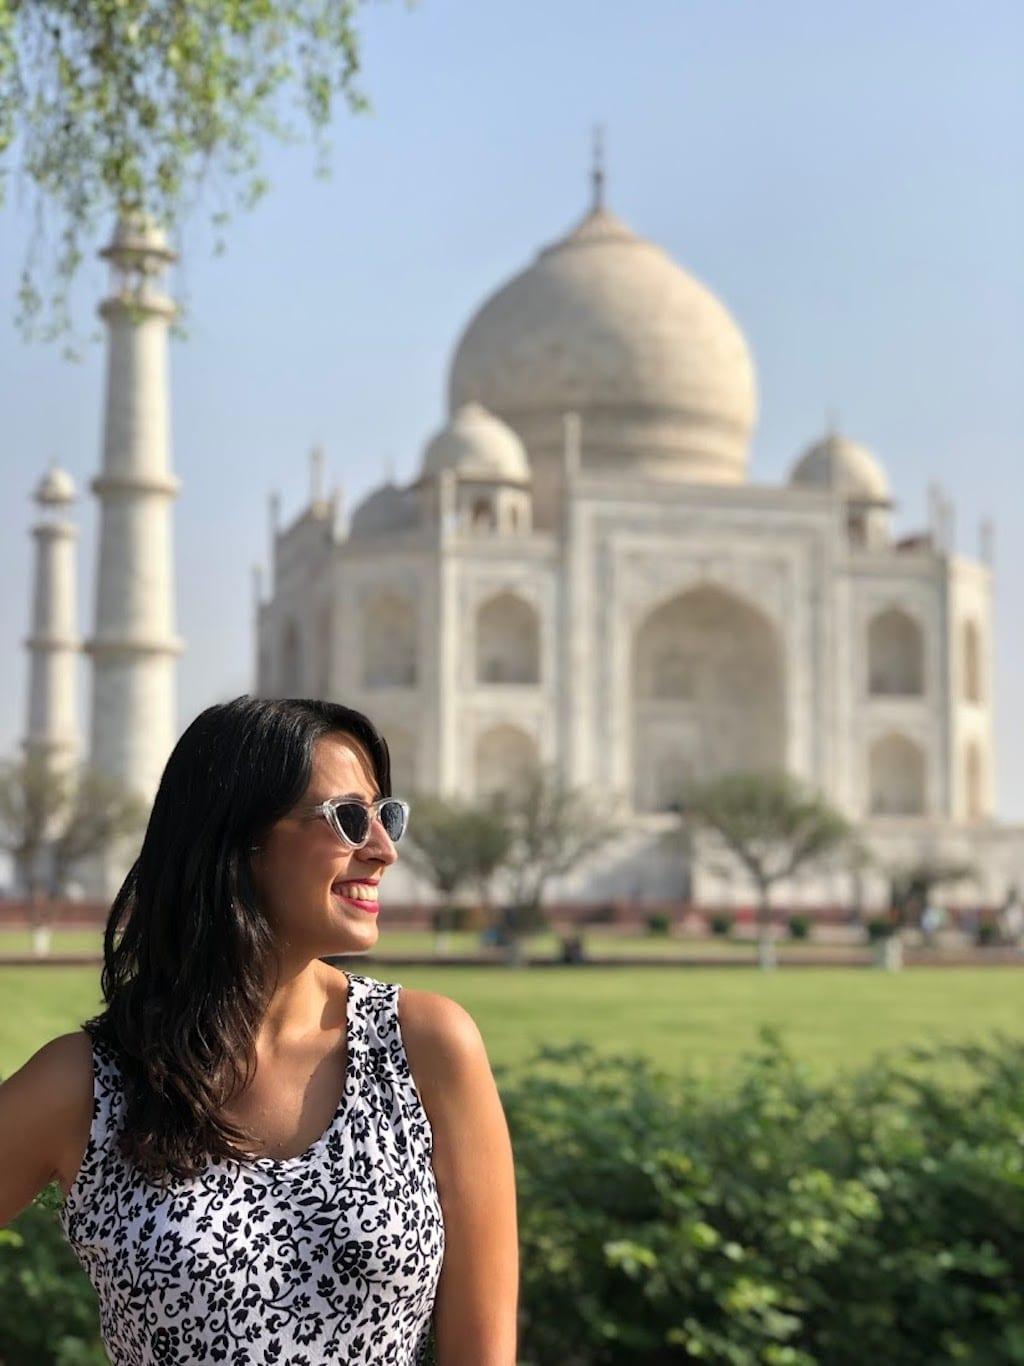 Guia para visitar o Taj Mahal